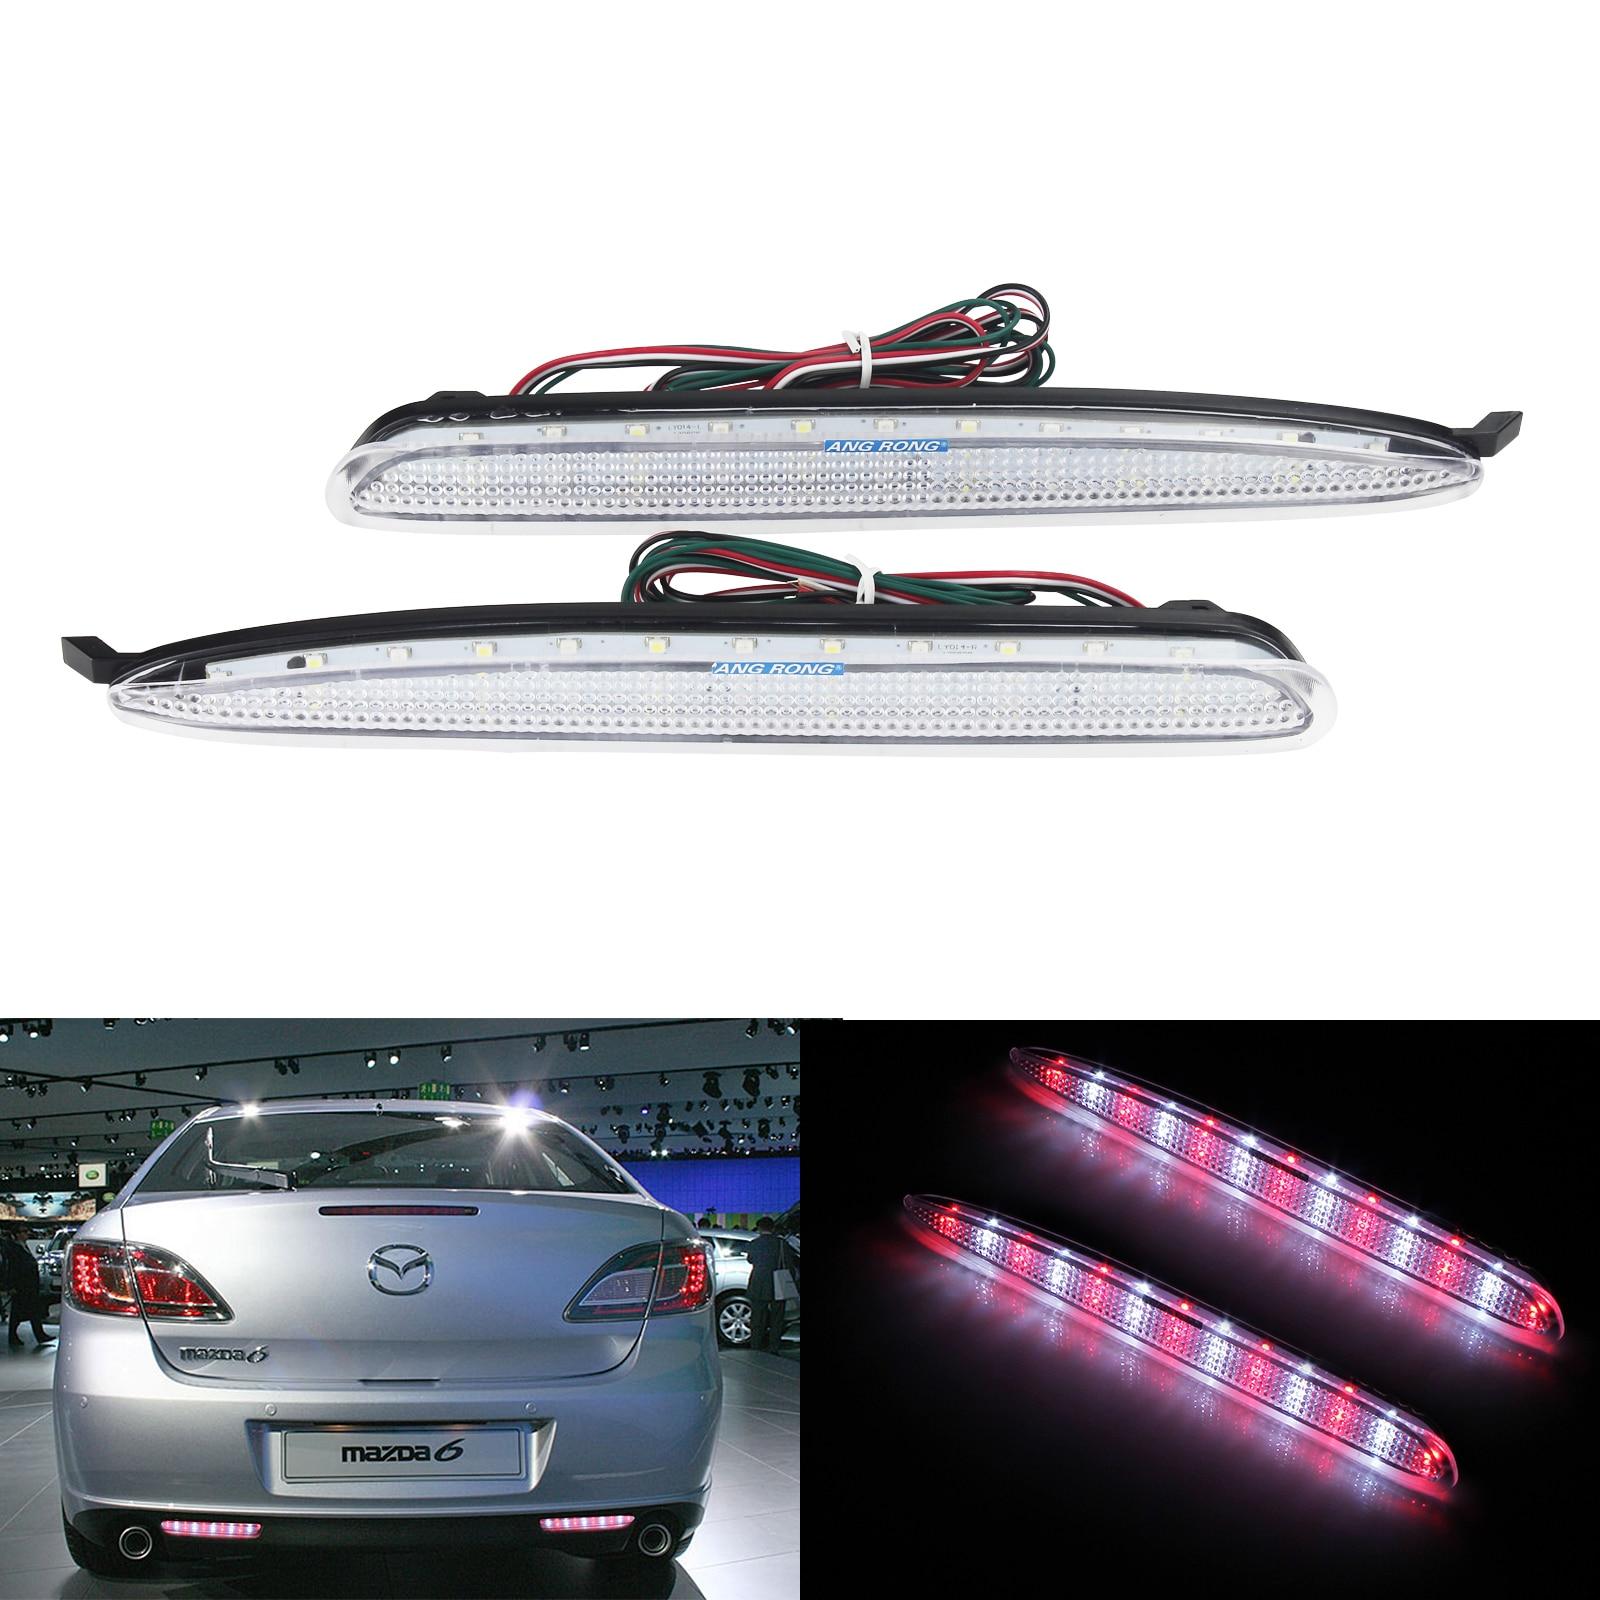 2x Tail LED Lens Bumper Reflector Brake Stop Light For Hyundai Sonata 8th